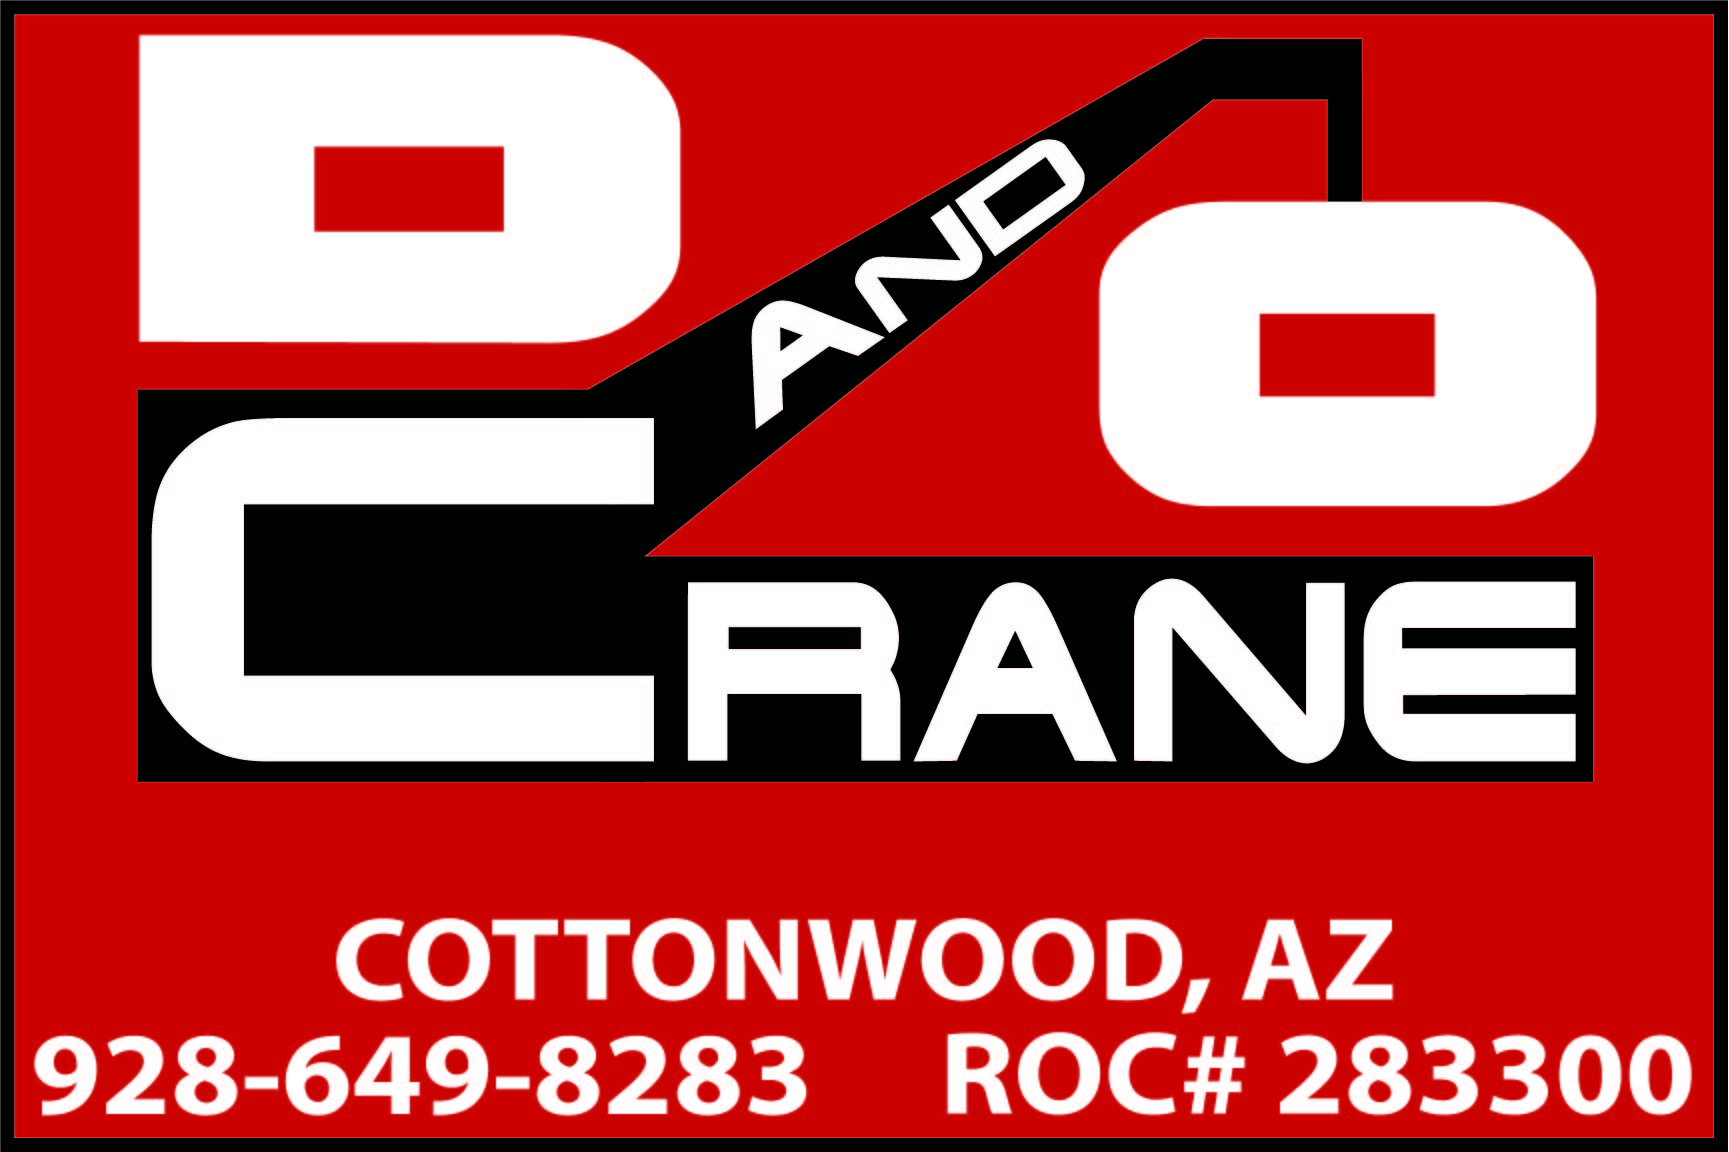 D and O Crane in Cottonwood Arizona